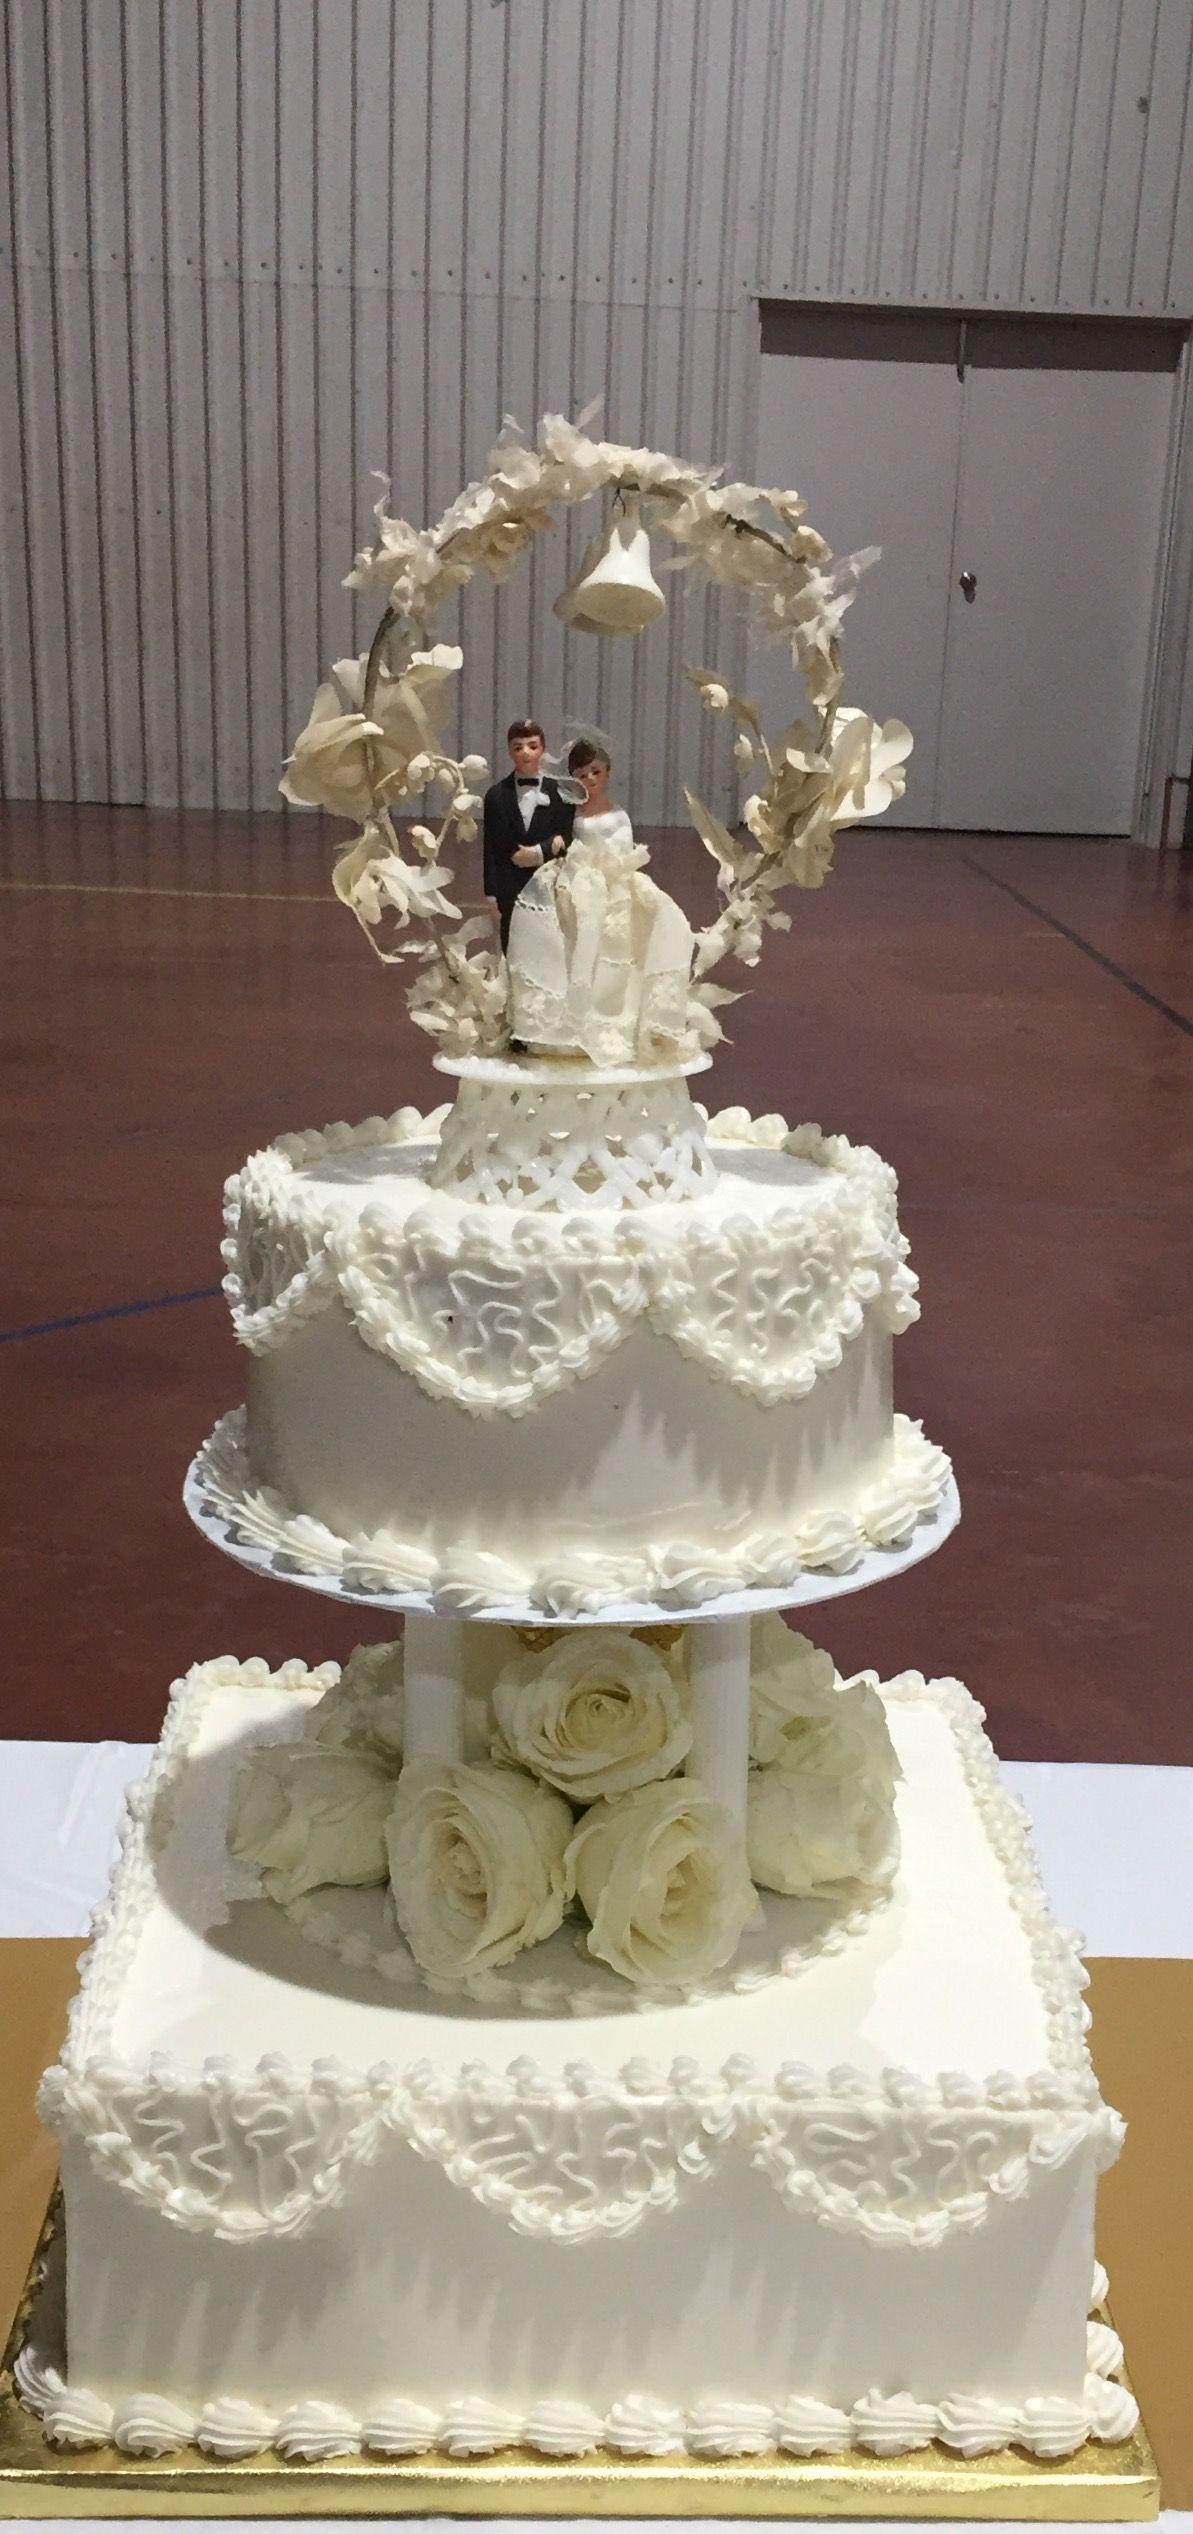 50th anniversary cake designs cake 50th anniversary